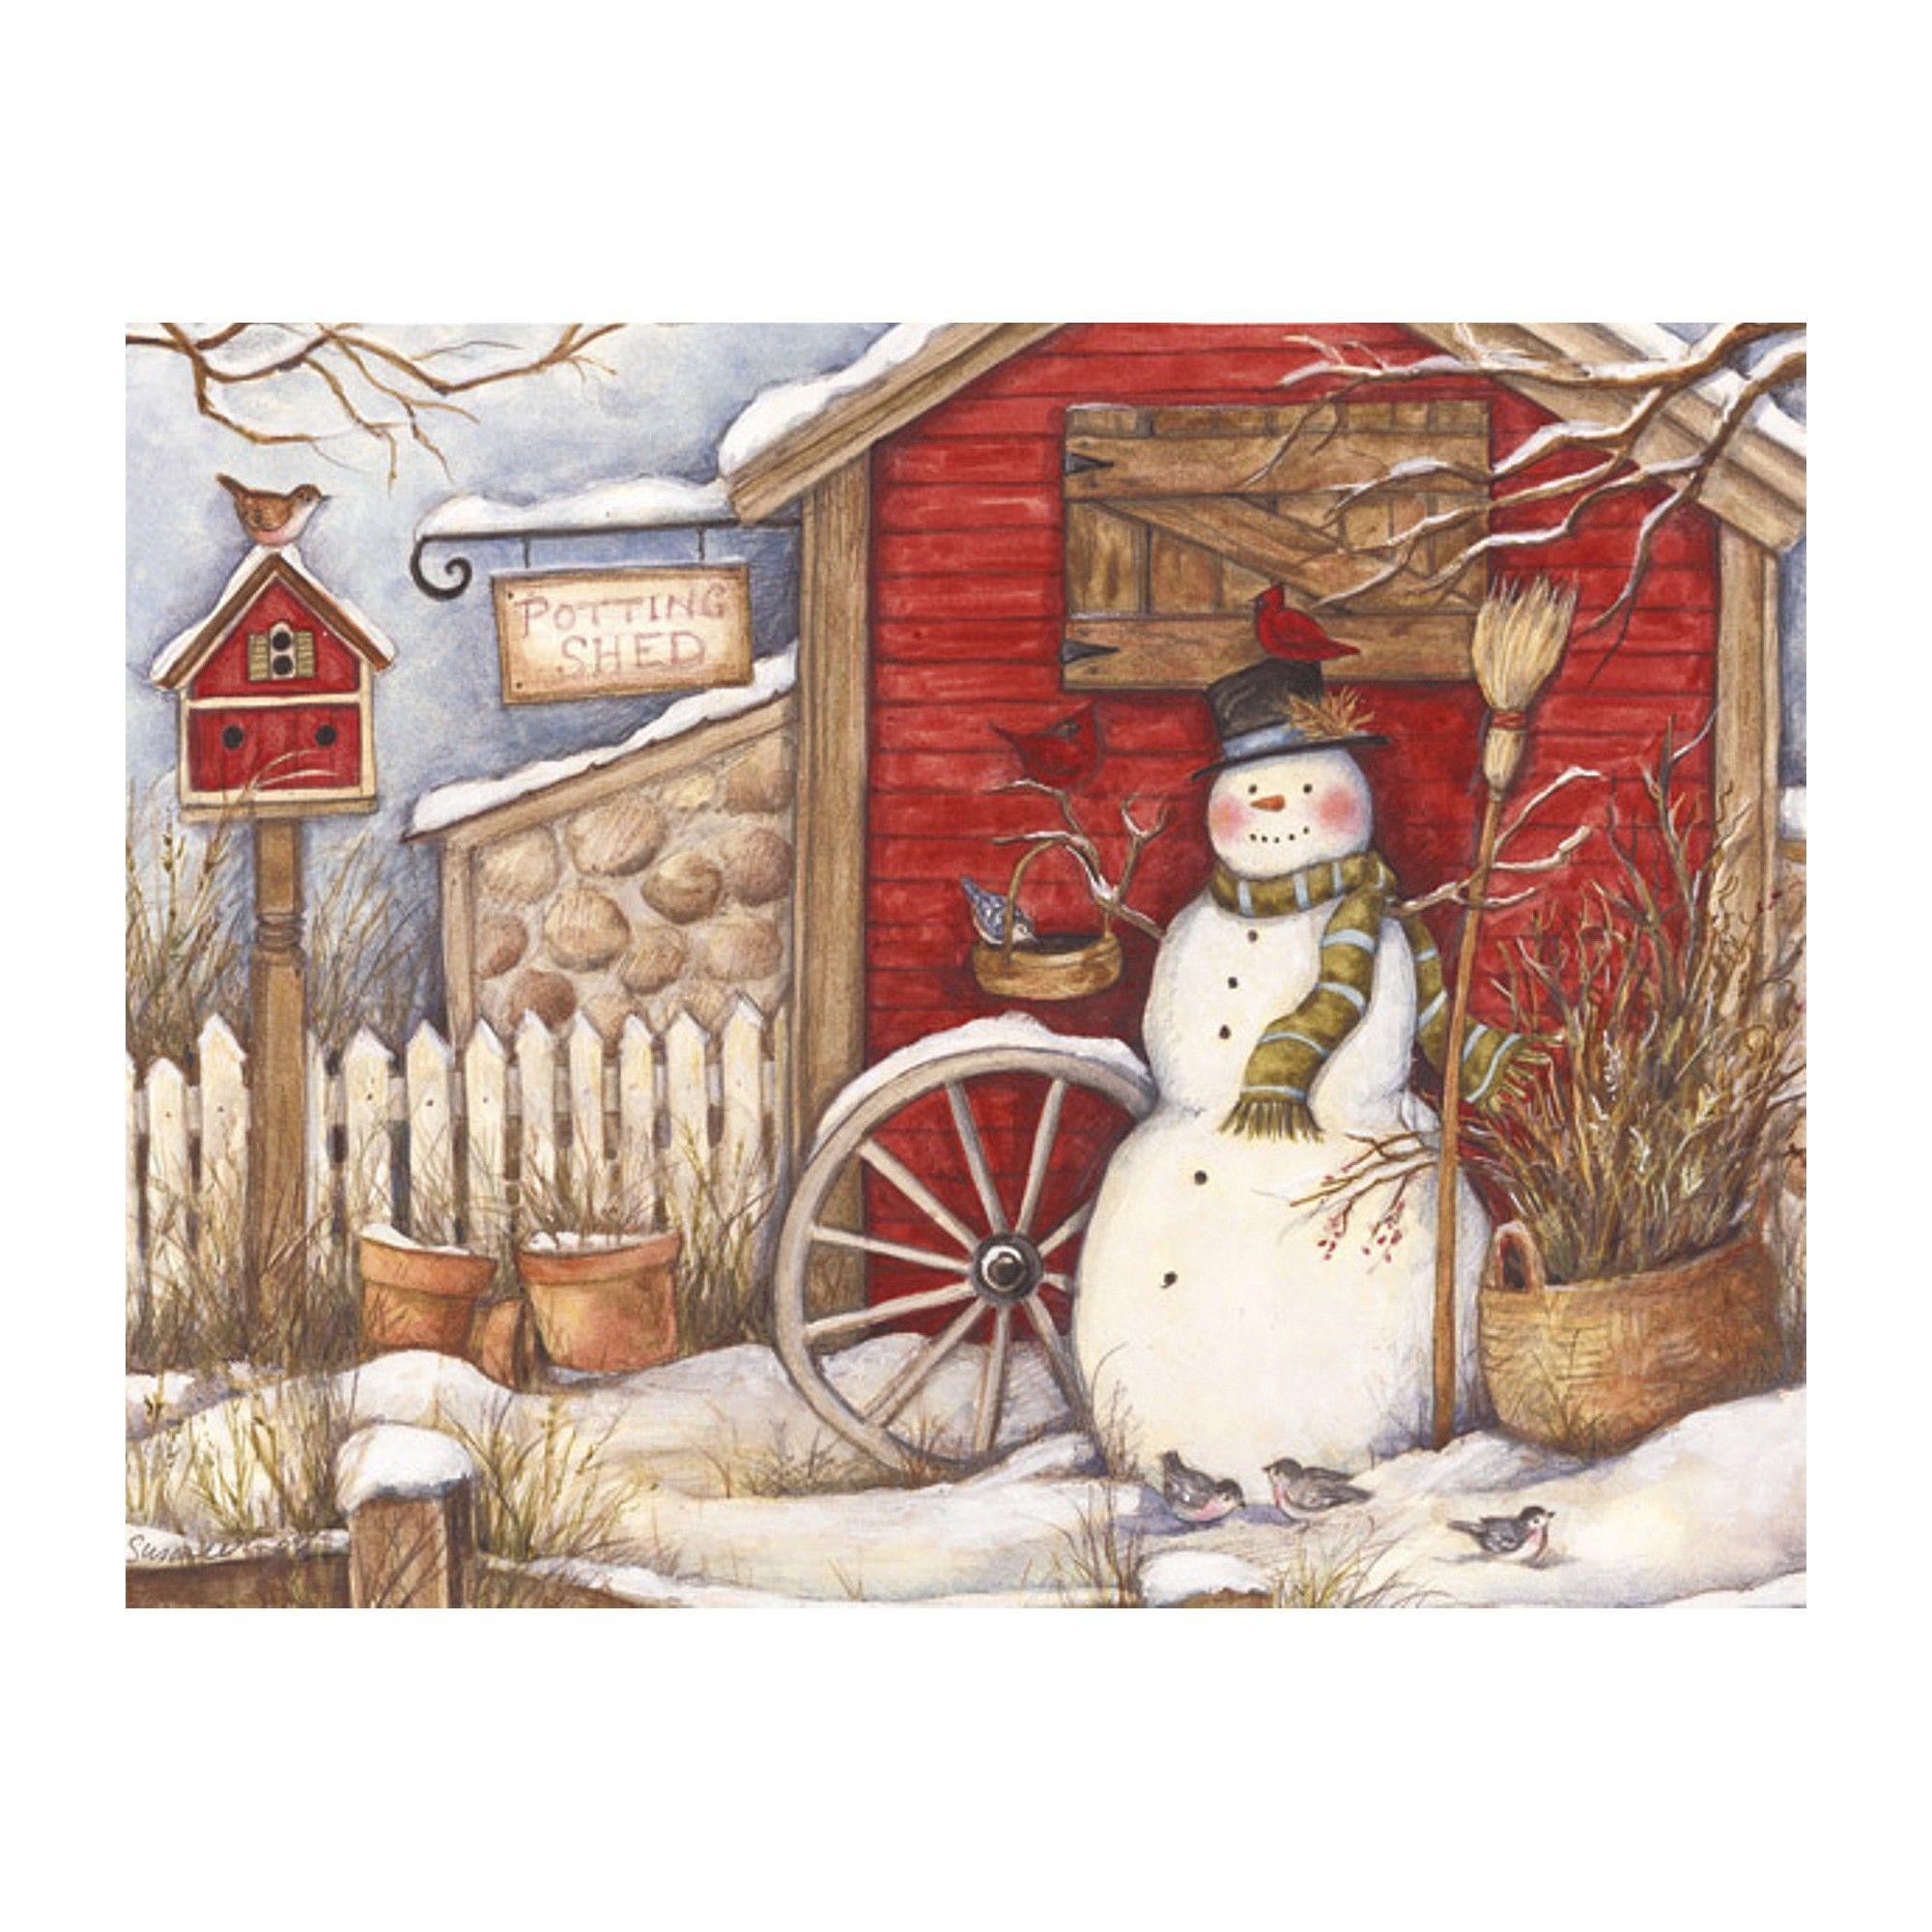 18ct Winter Barn Holiday Boxed Cards Christmas prints